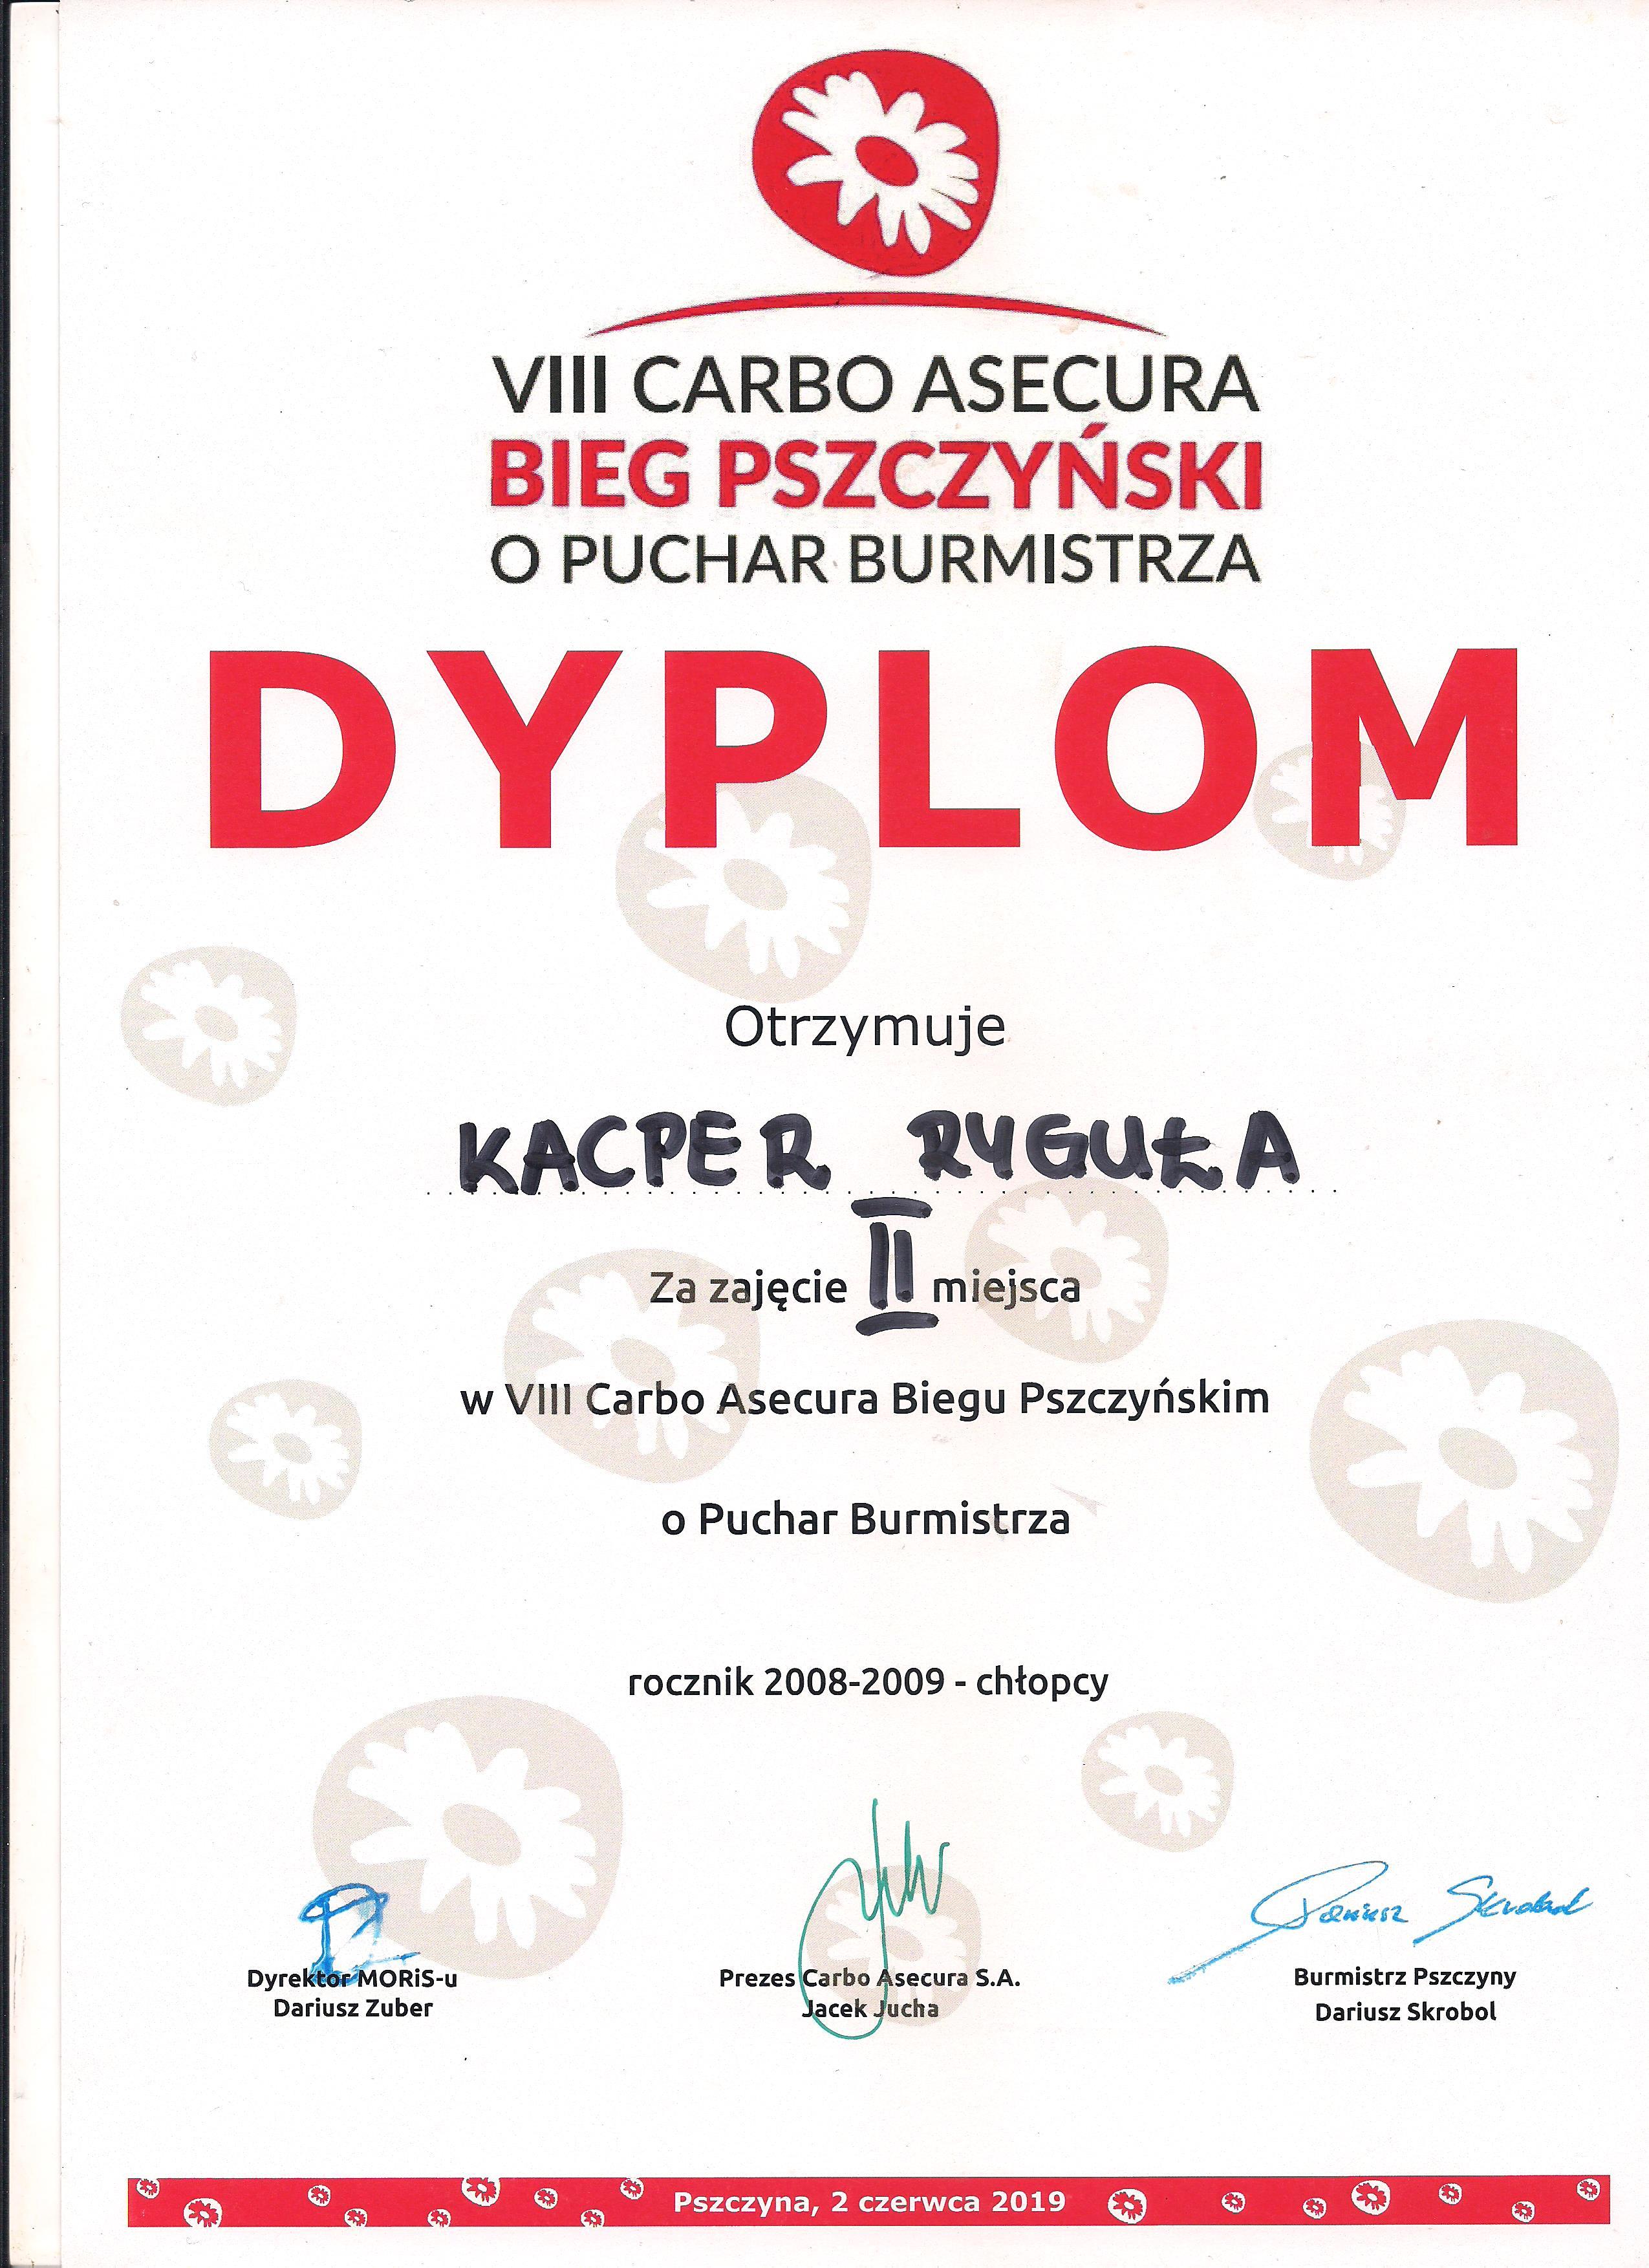 Dyplom1 001